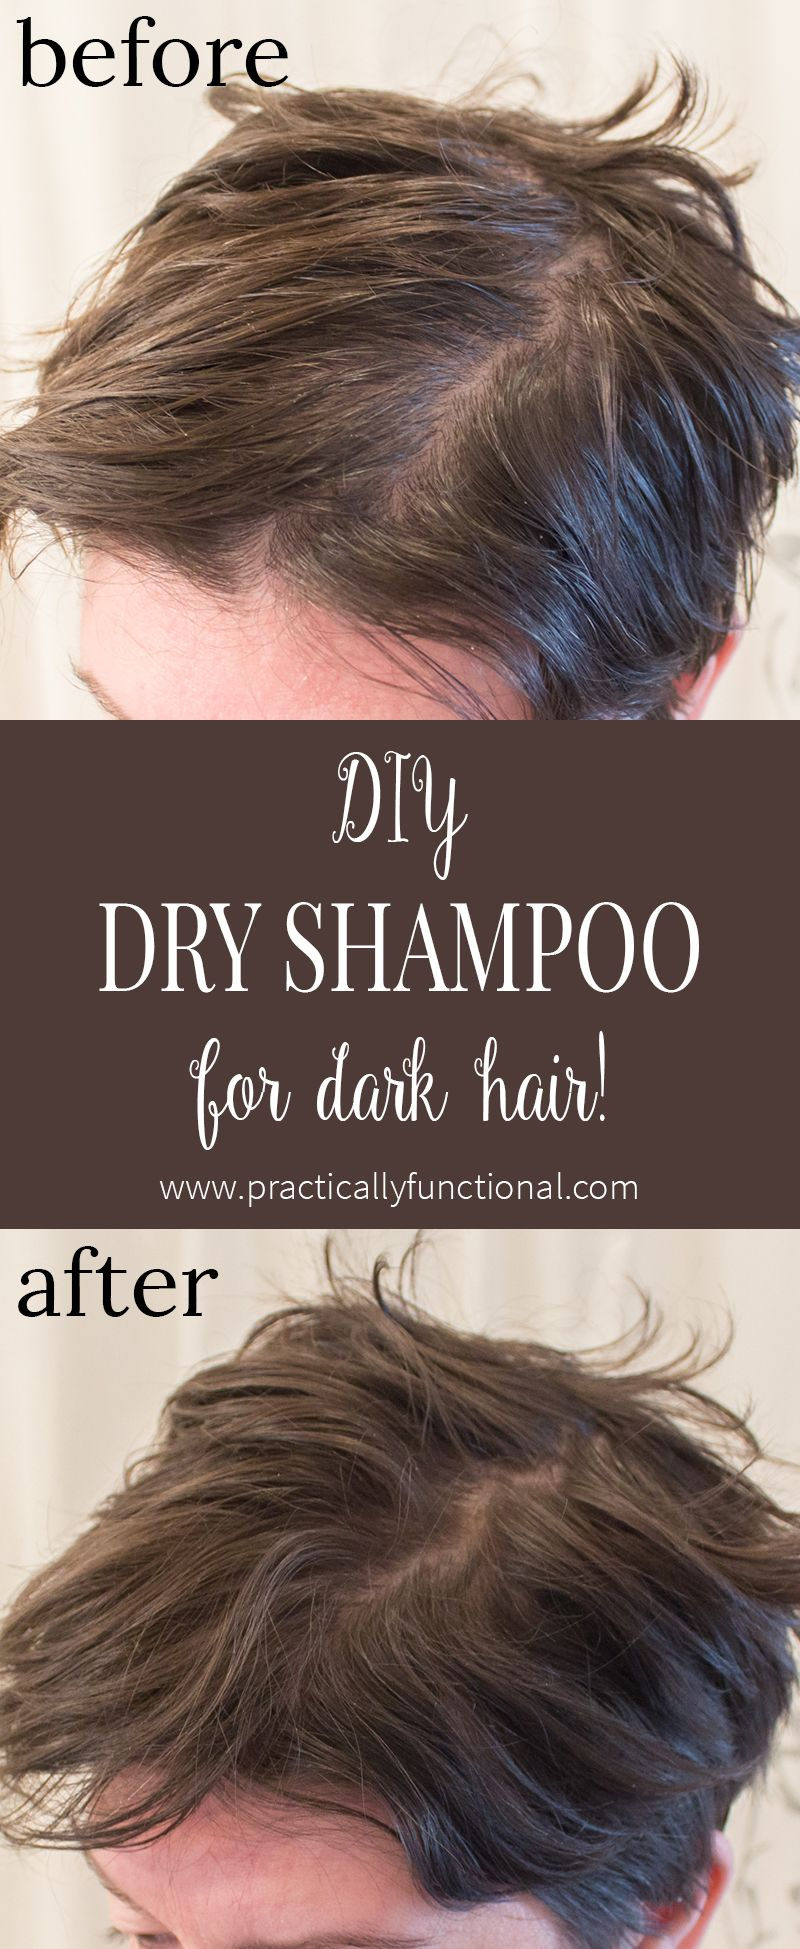 diy dry shampoo for dark hair   practically functional   diy